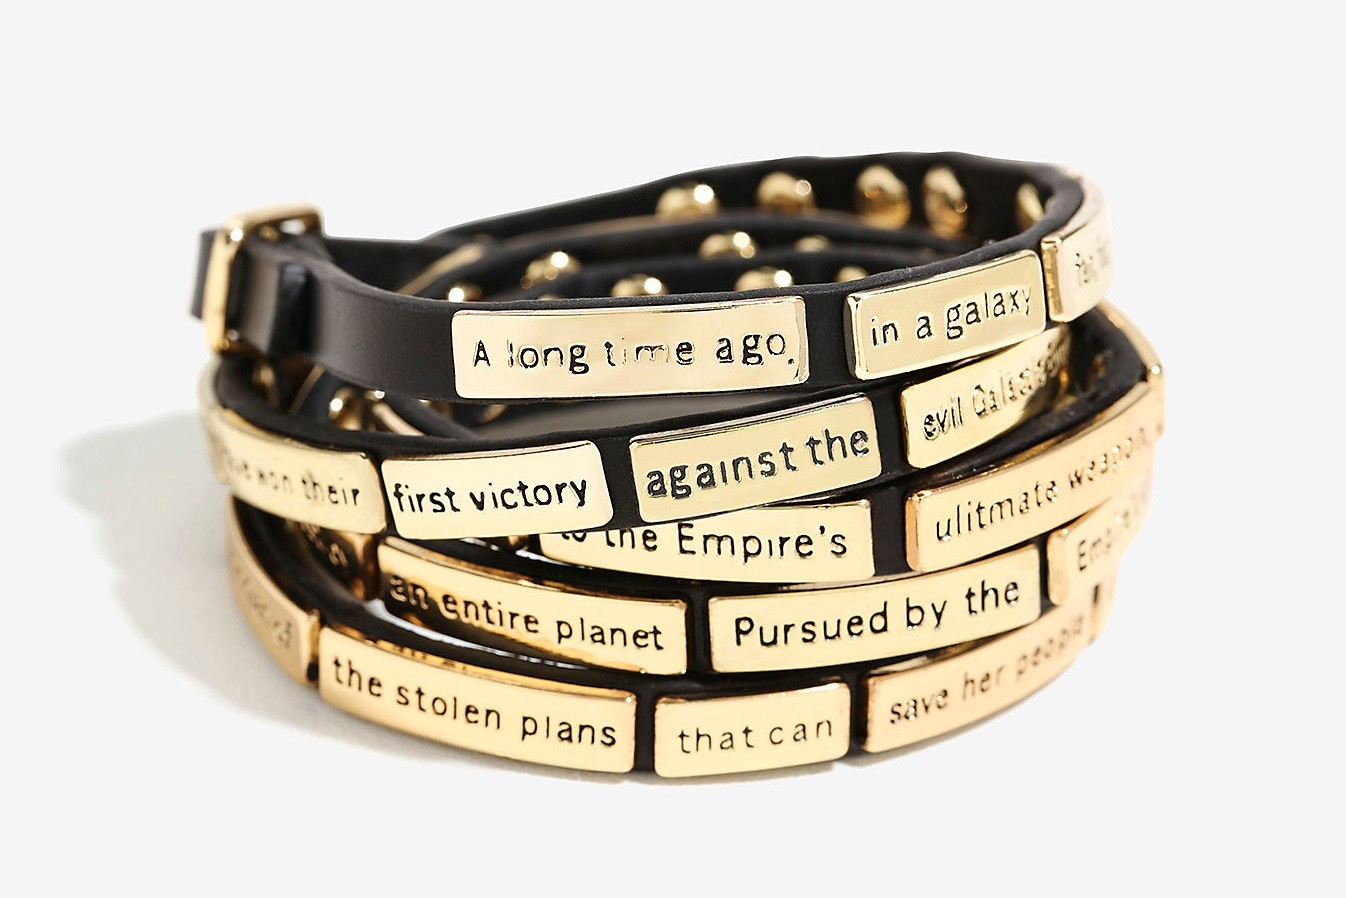 Star Wars wrap bracelet at Box Lunch